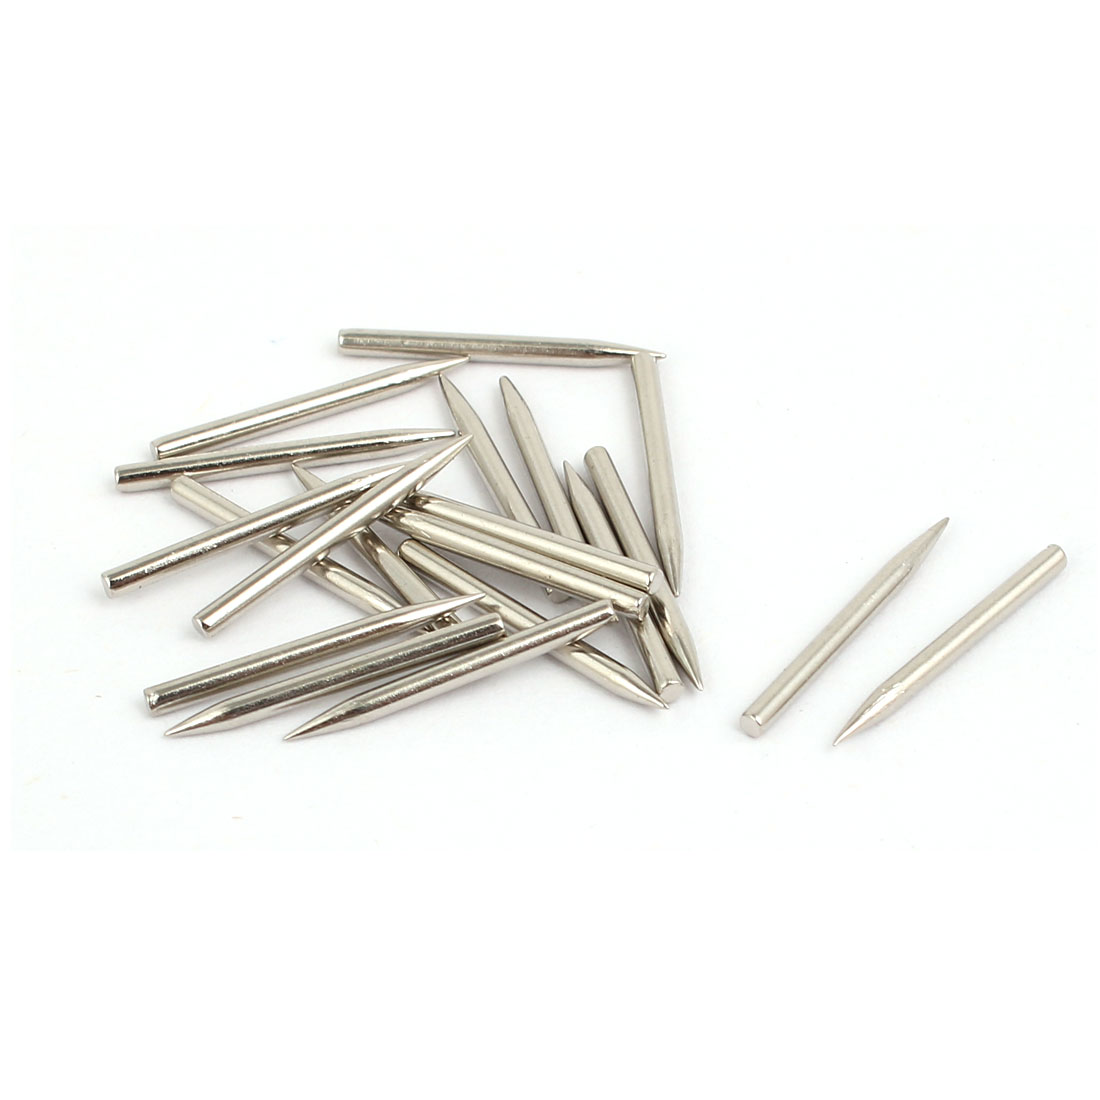 1.4mm x 17mm Carbon Steel Non-Head Siding Wall Cement Nail 20pcs